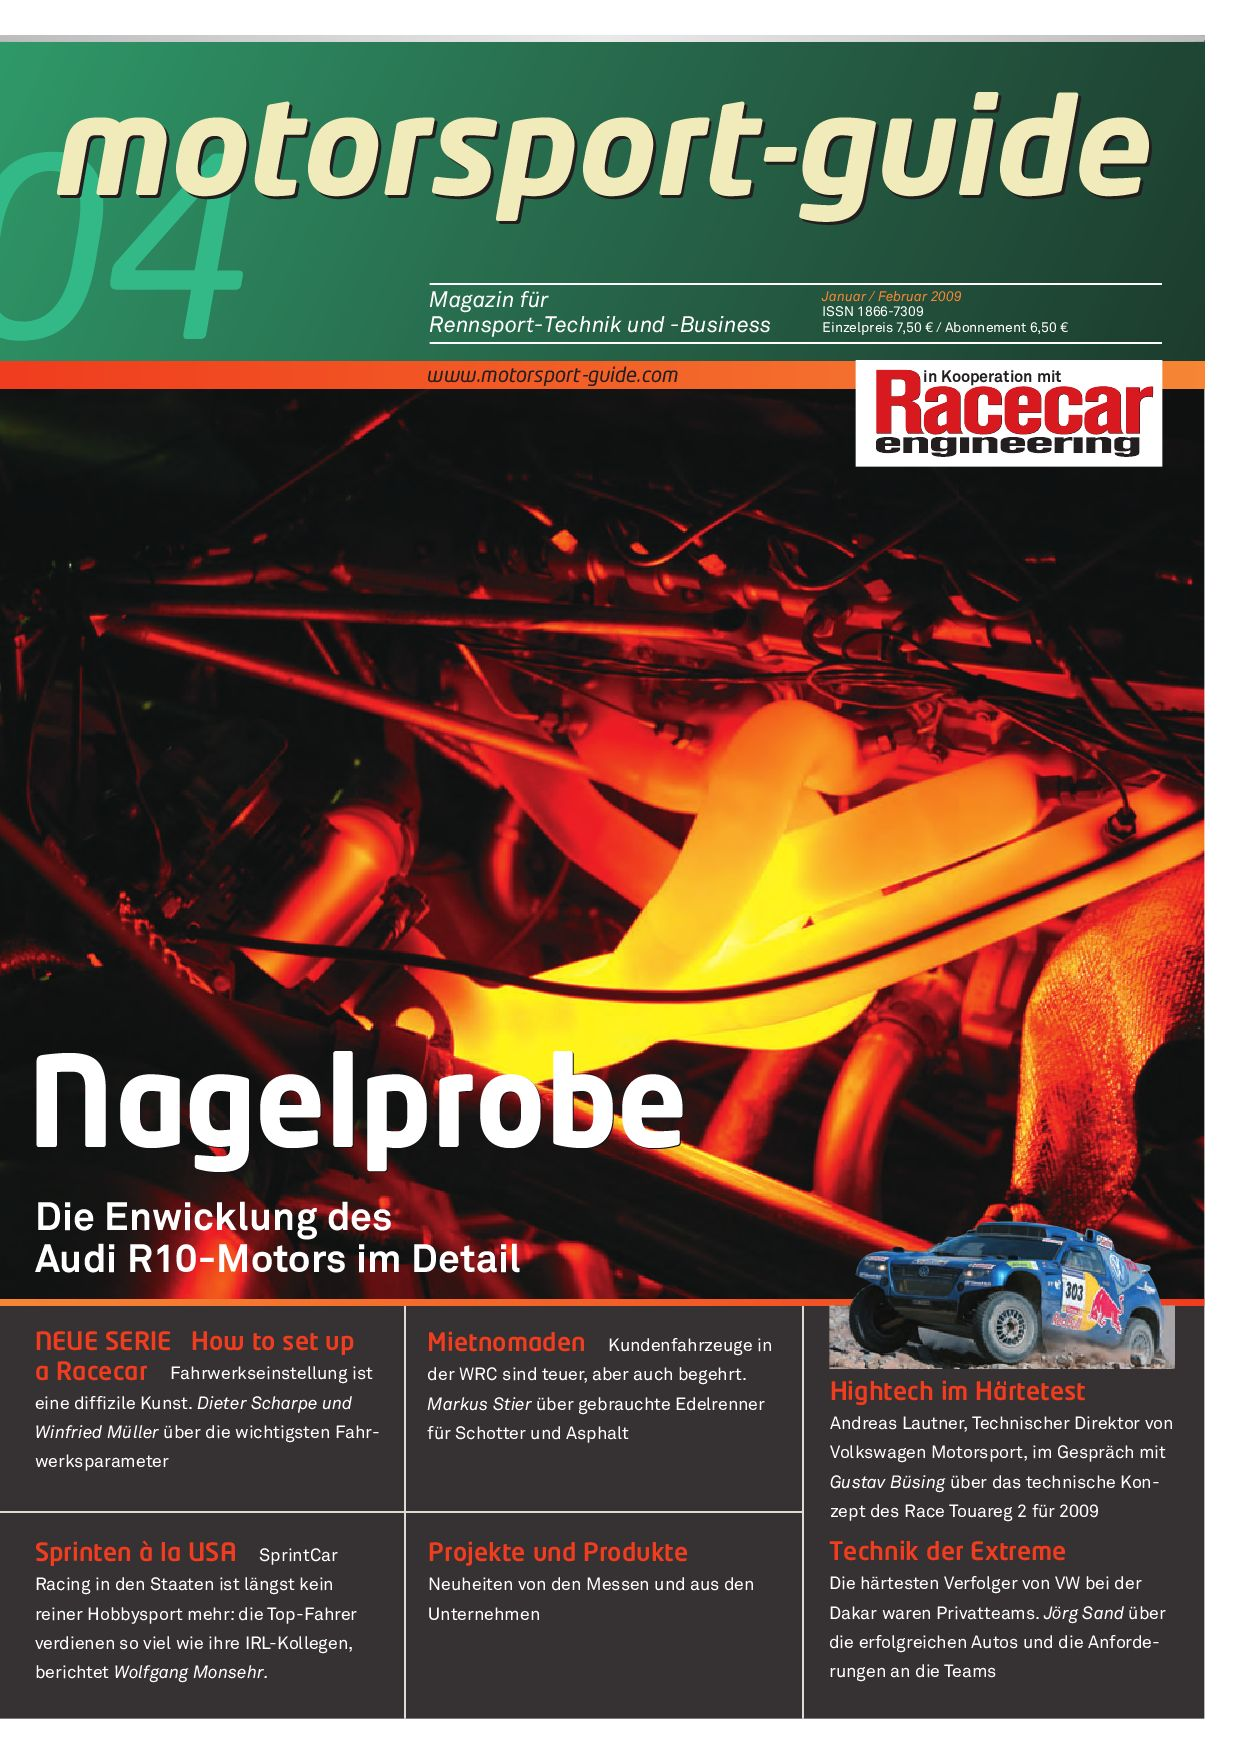 motorsport-guide 04-2009 by motorsport-guide - issuu